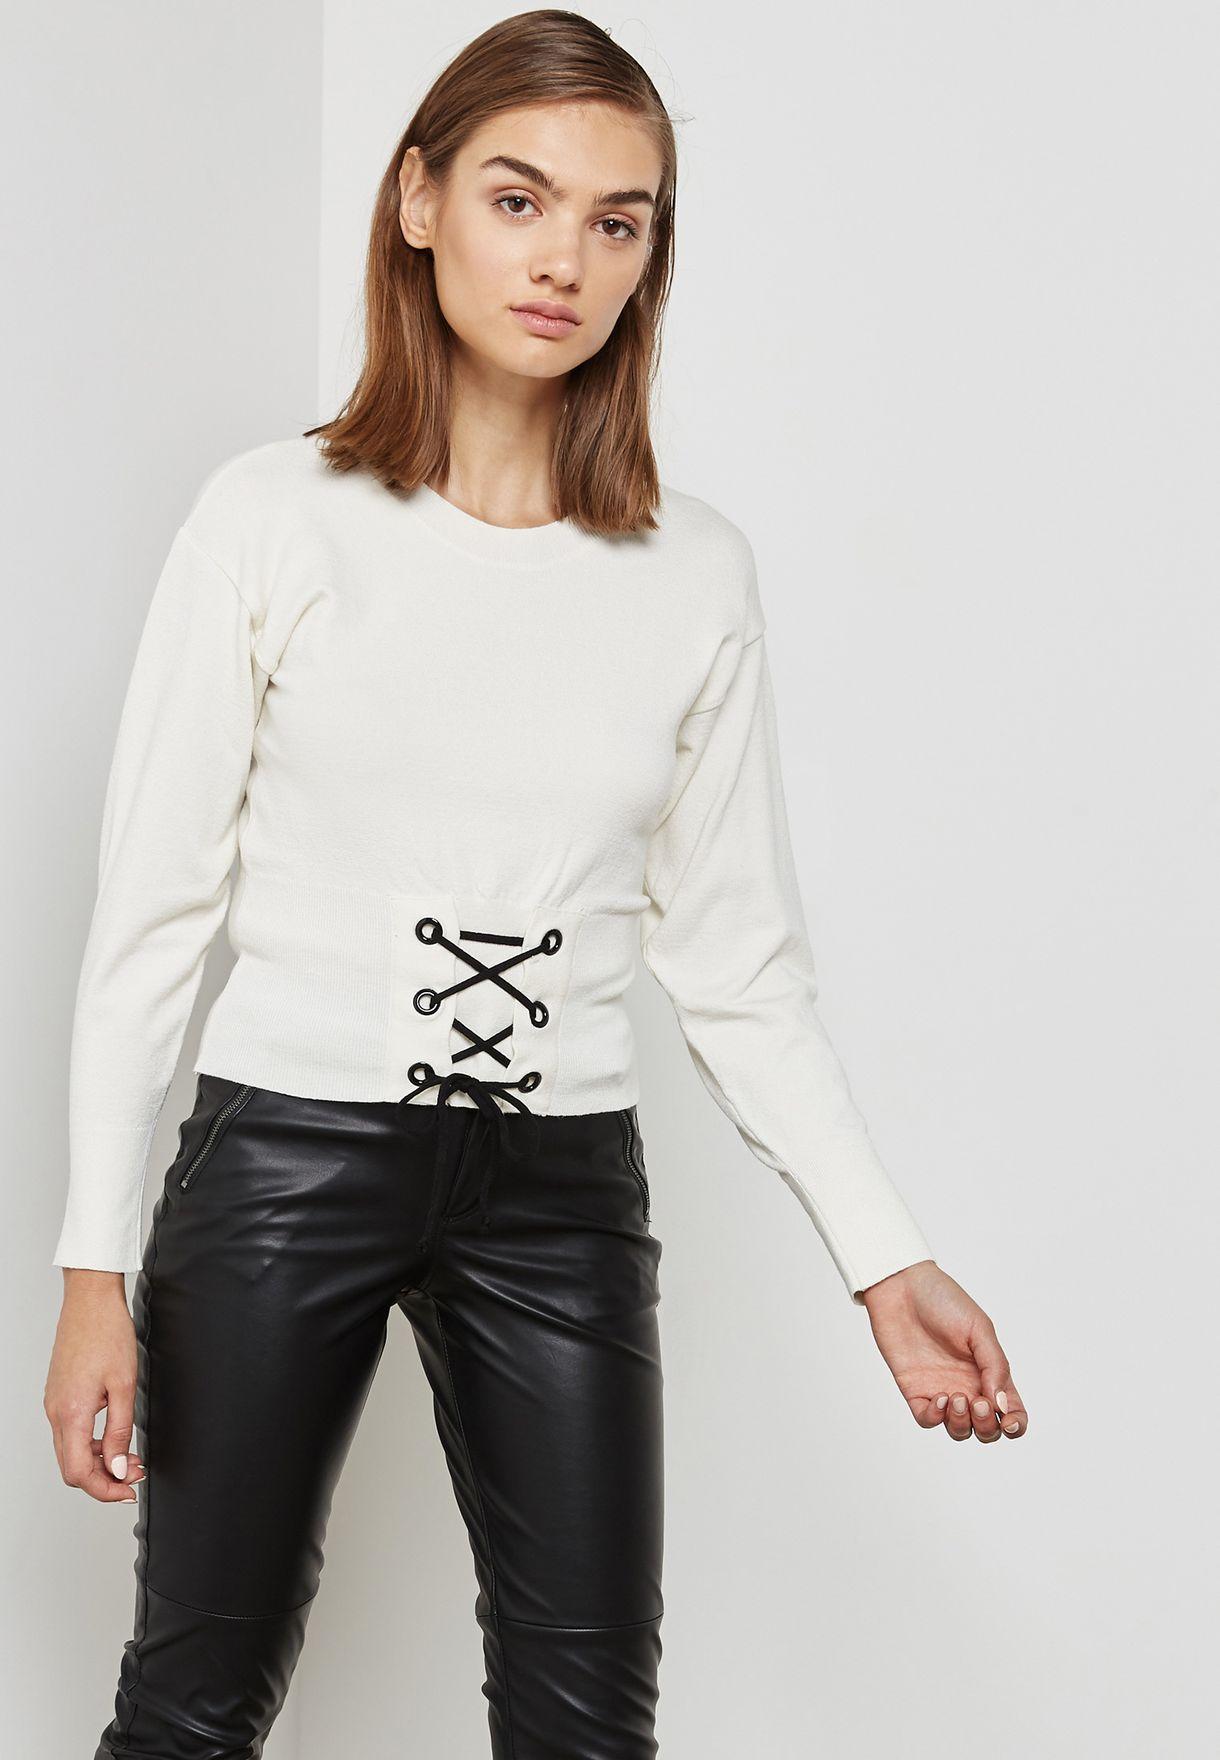 c28253269bc Shop Topshop white Corset Detail Sweatshirt 23E06MCRM for Women in ...